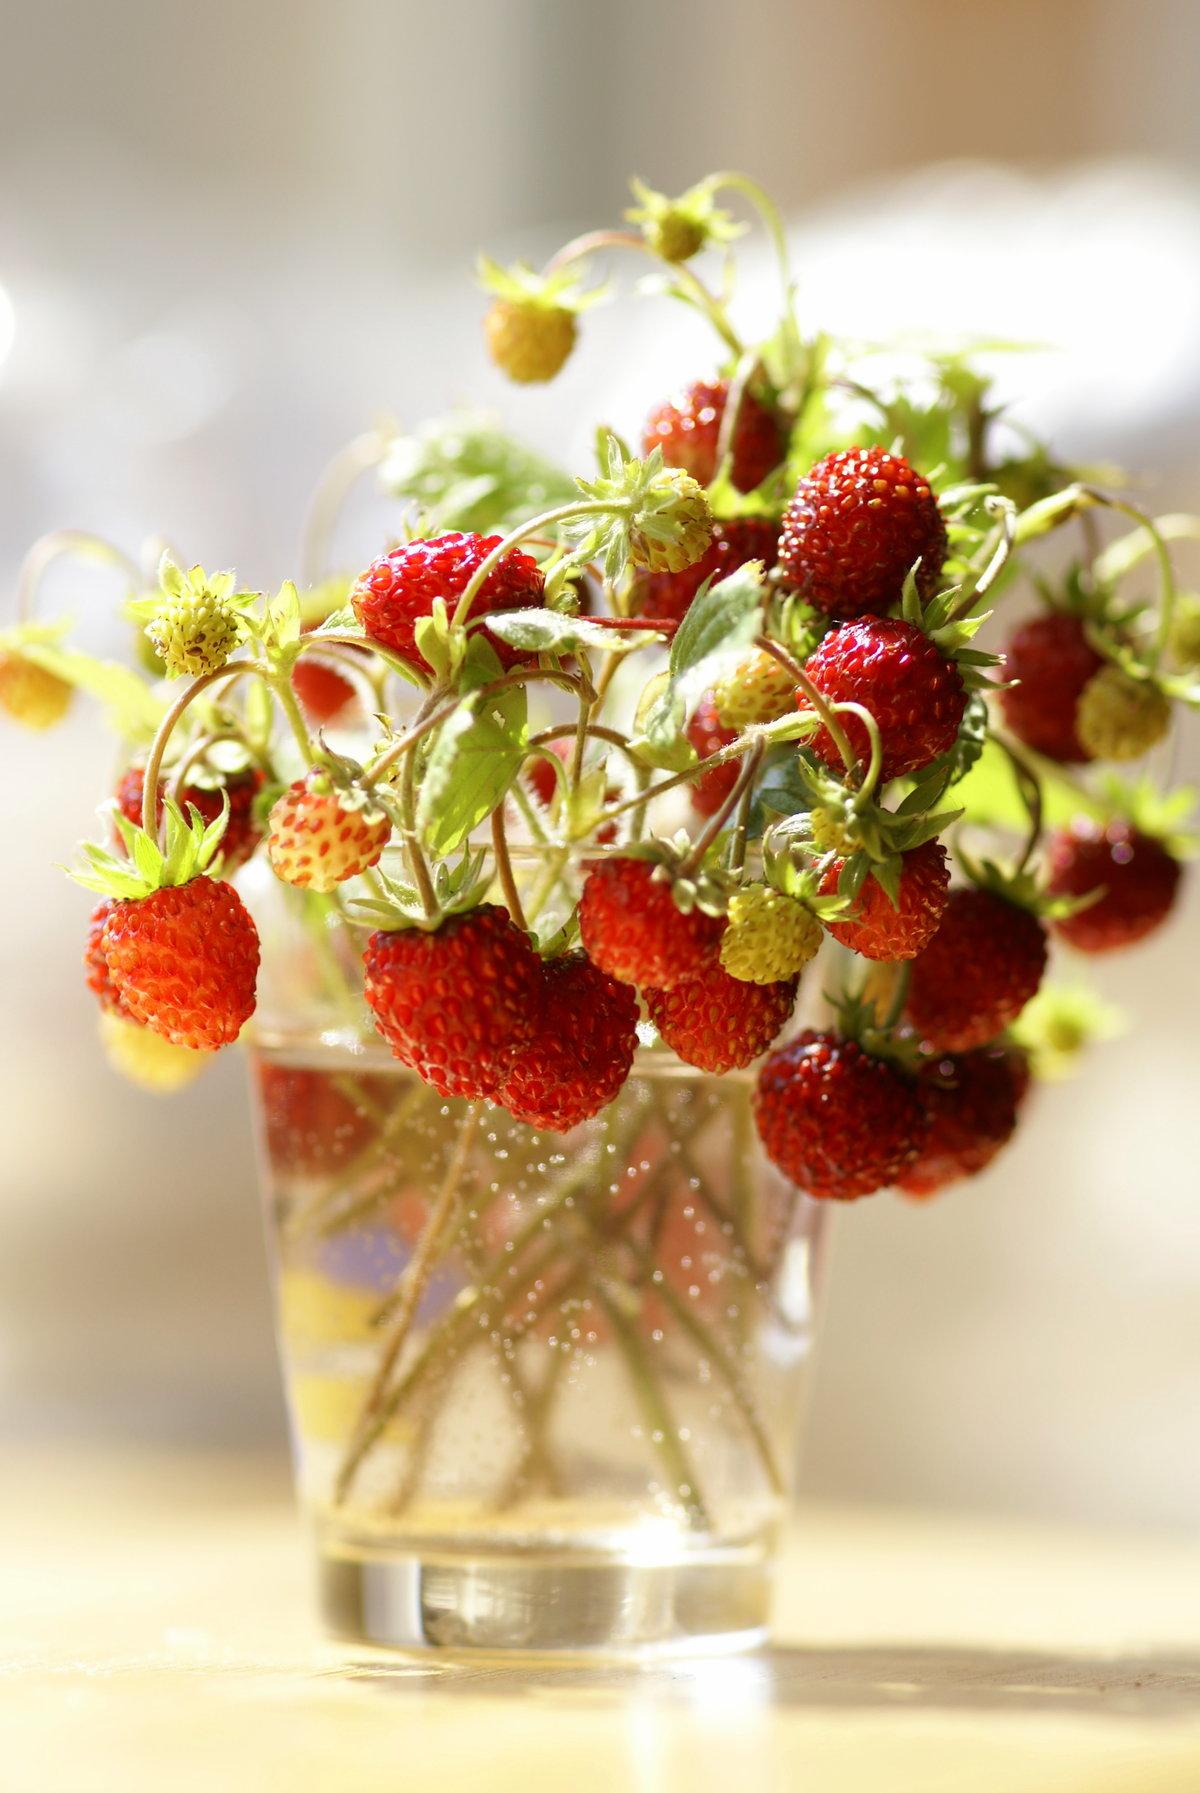 ягодное утро картинки сковороде